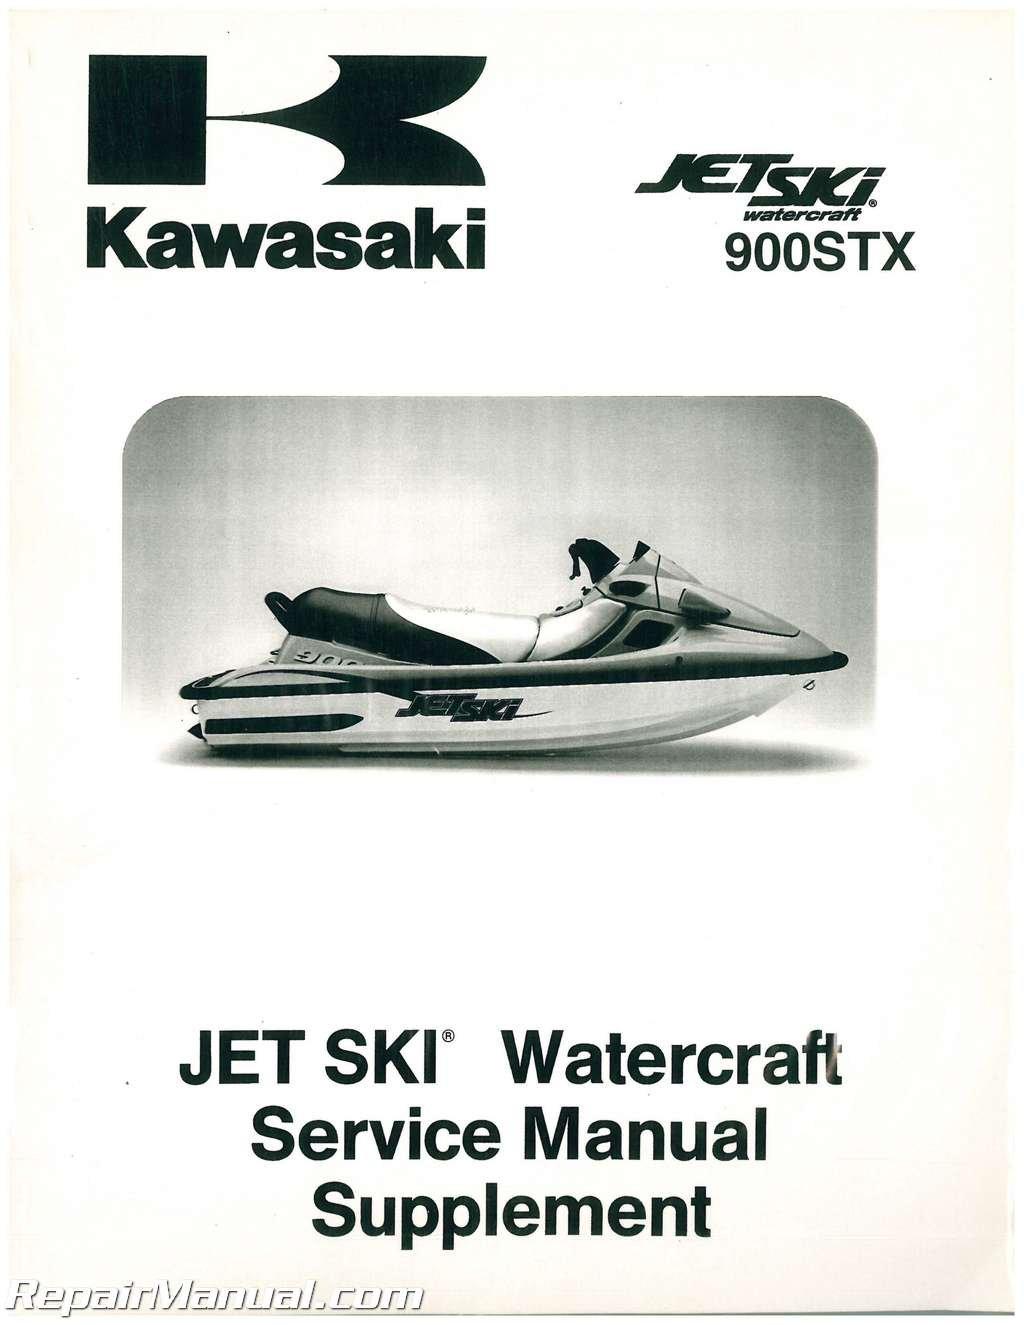 99924 1242 52 1999 2002 kawasaki 900 stx jet ski factory service rh amazon com kawasaki 900 stx owners manual kawasaki 900 stx repair manual